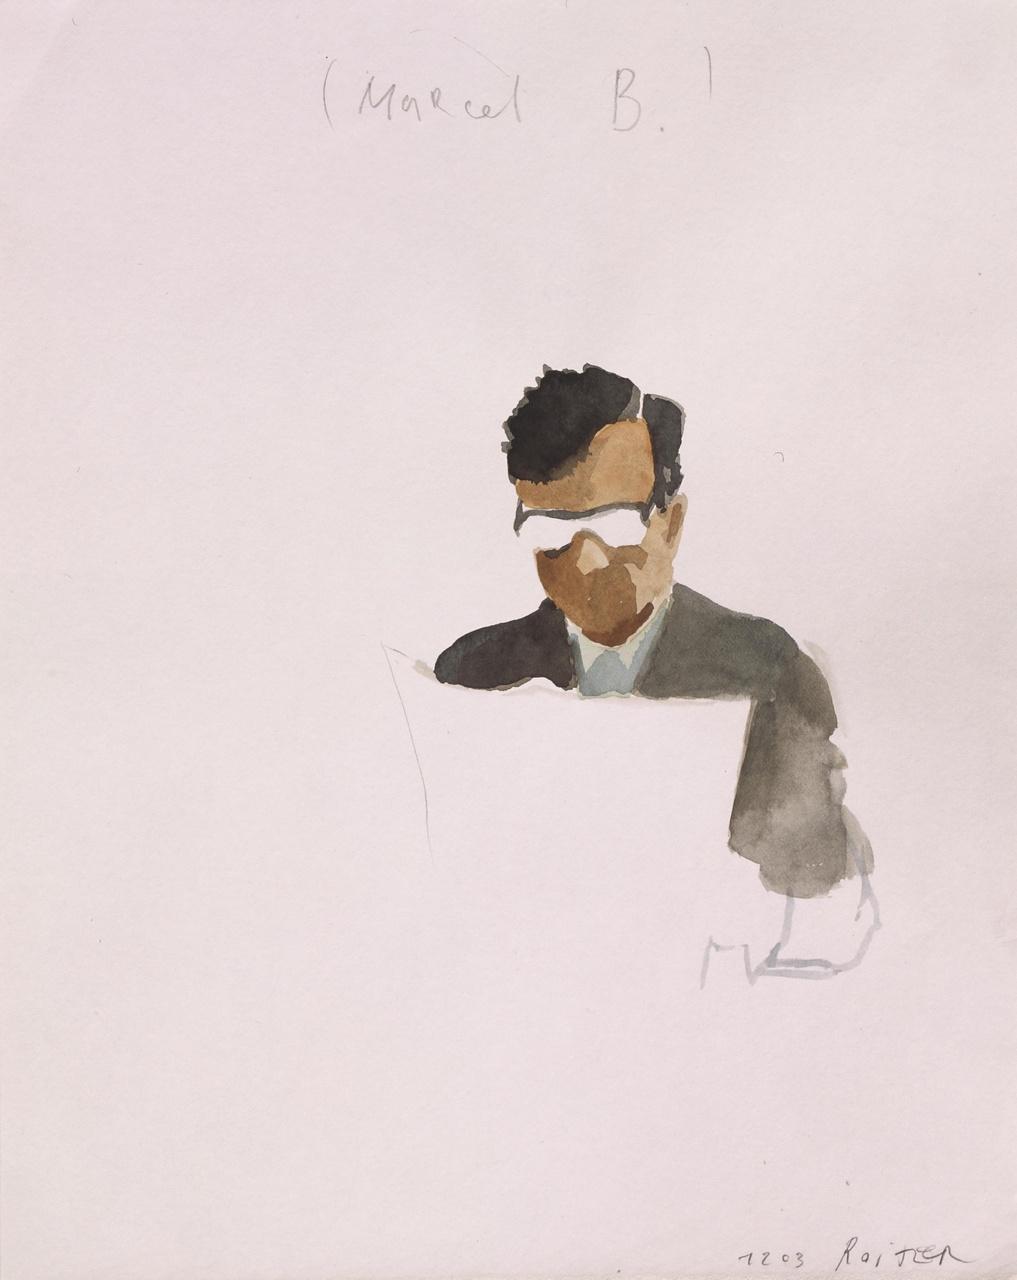 Marcel B.(Artist at work)